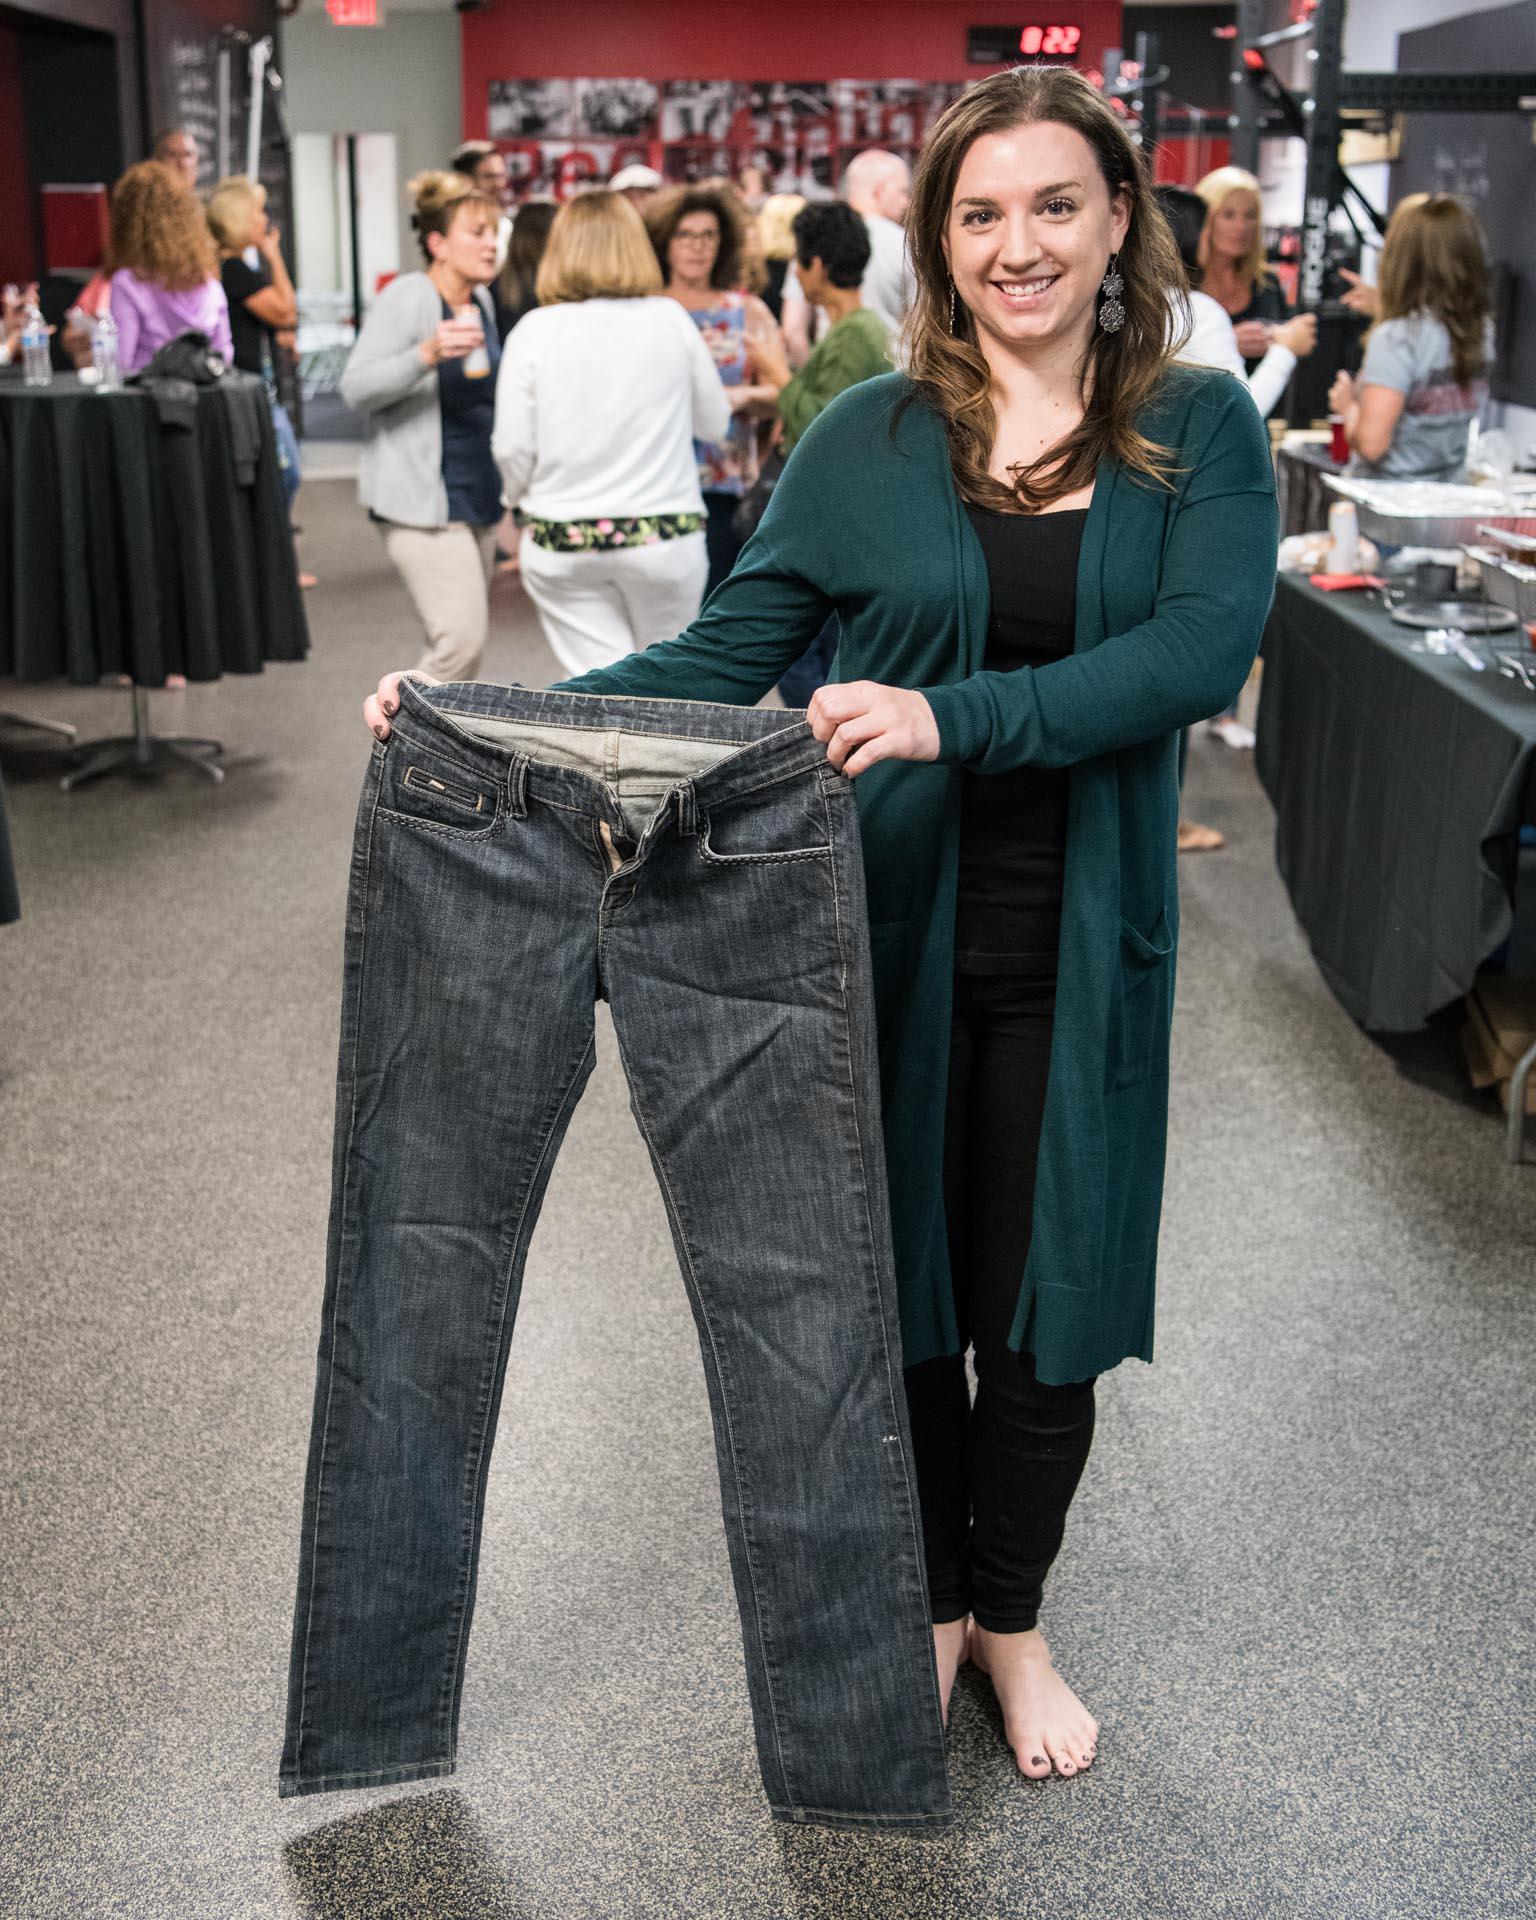 christine jeans 4x5.jpg